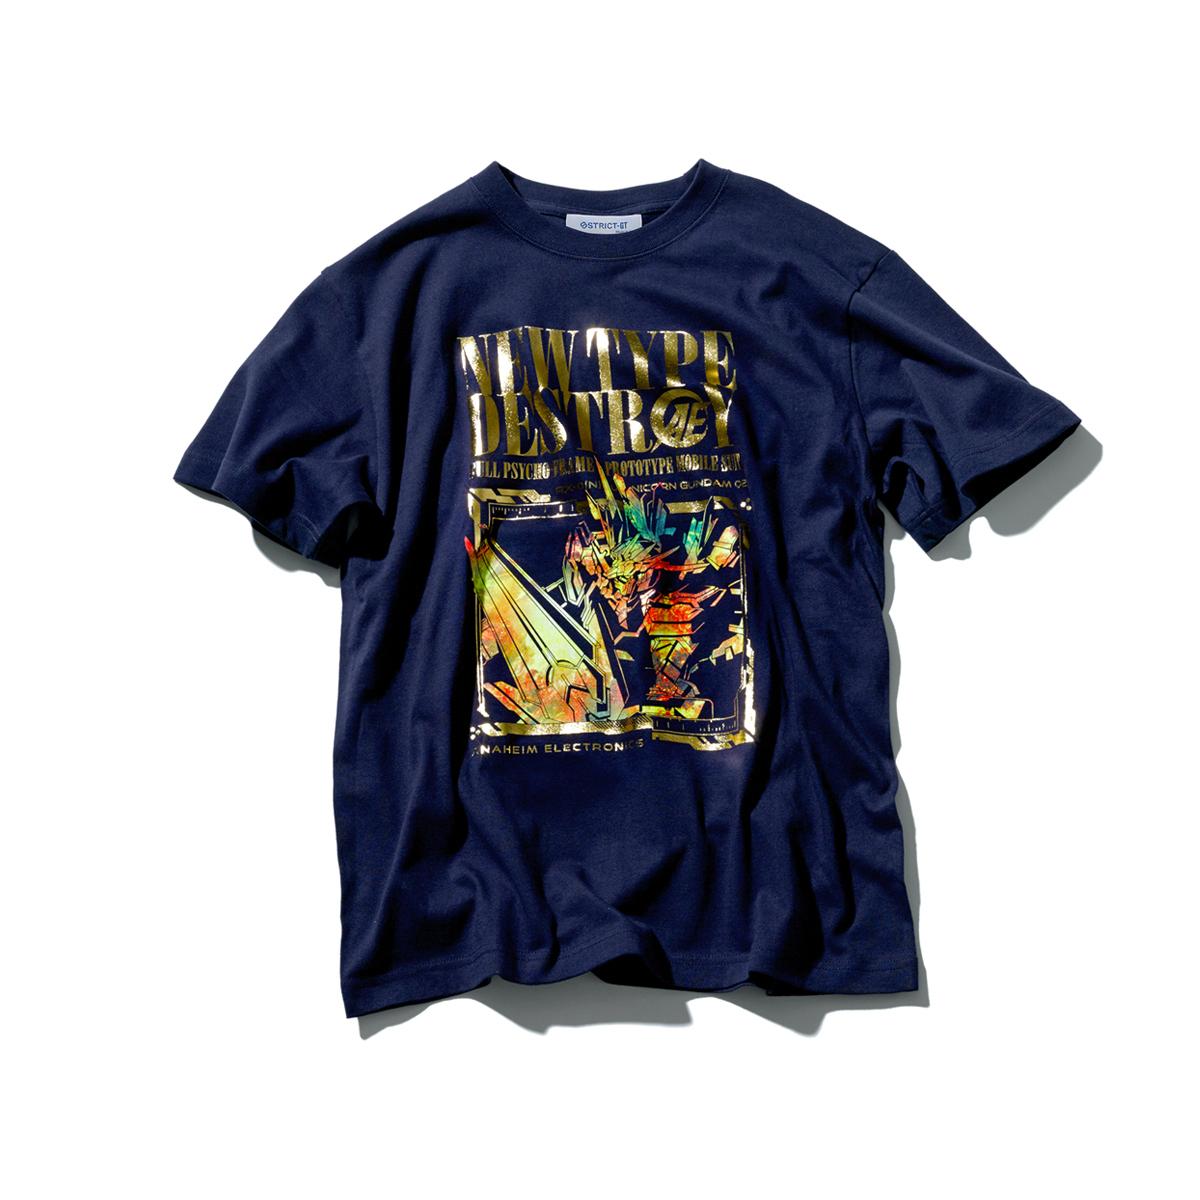 RX-0 Unicorn Gundam 02 Banshee T-shirt—Mobile Suit Gundam Unicorn